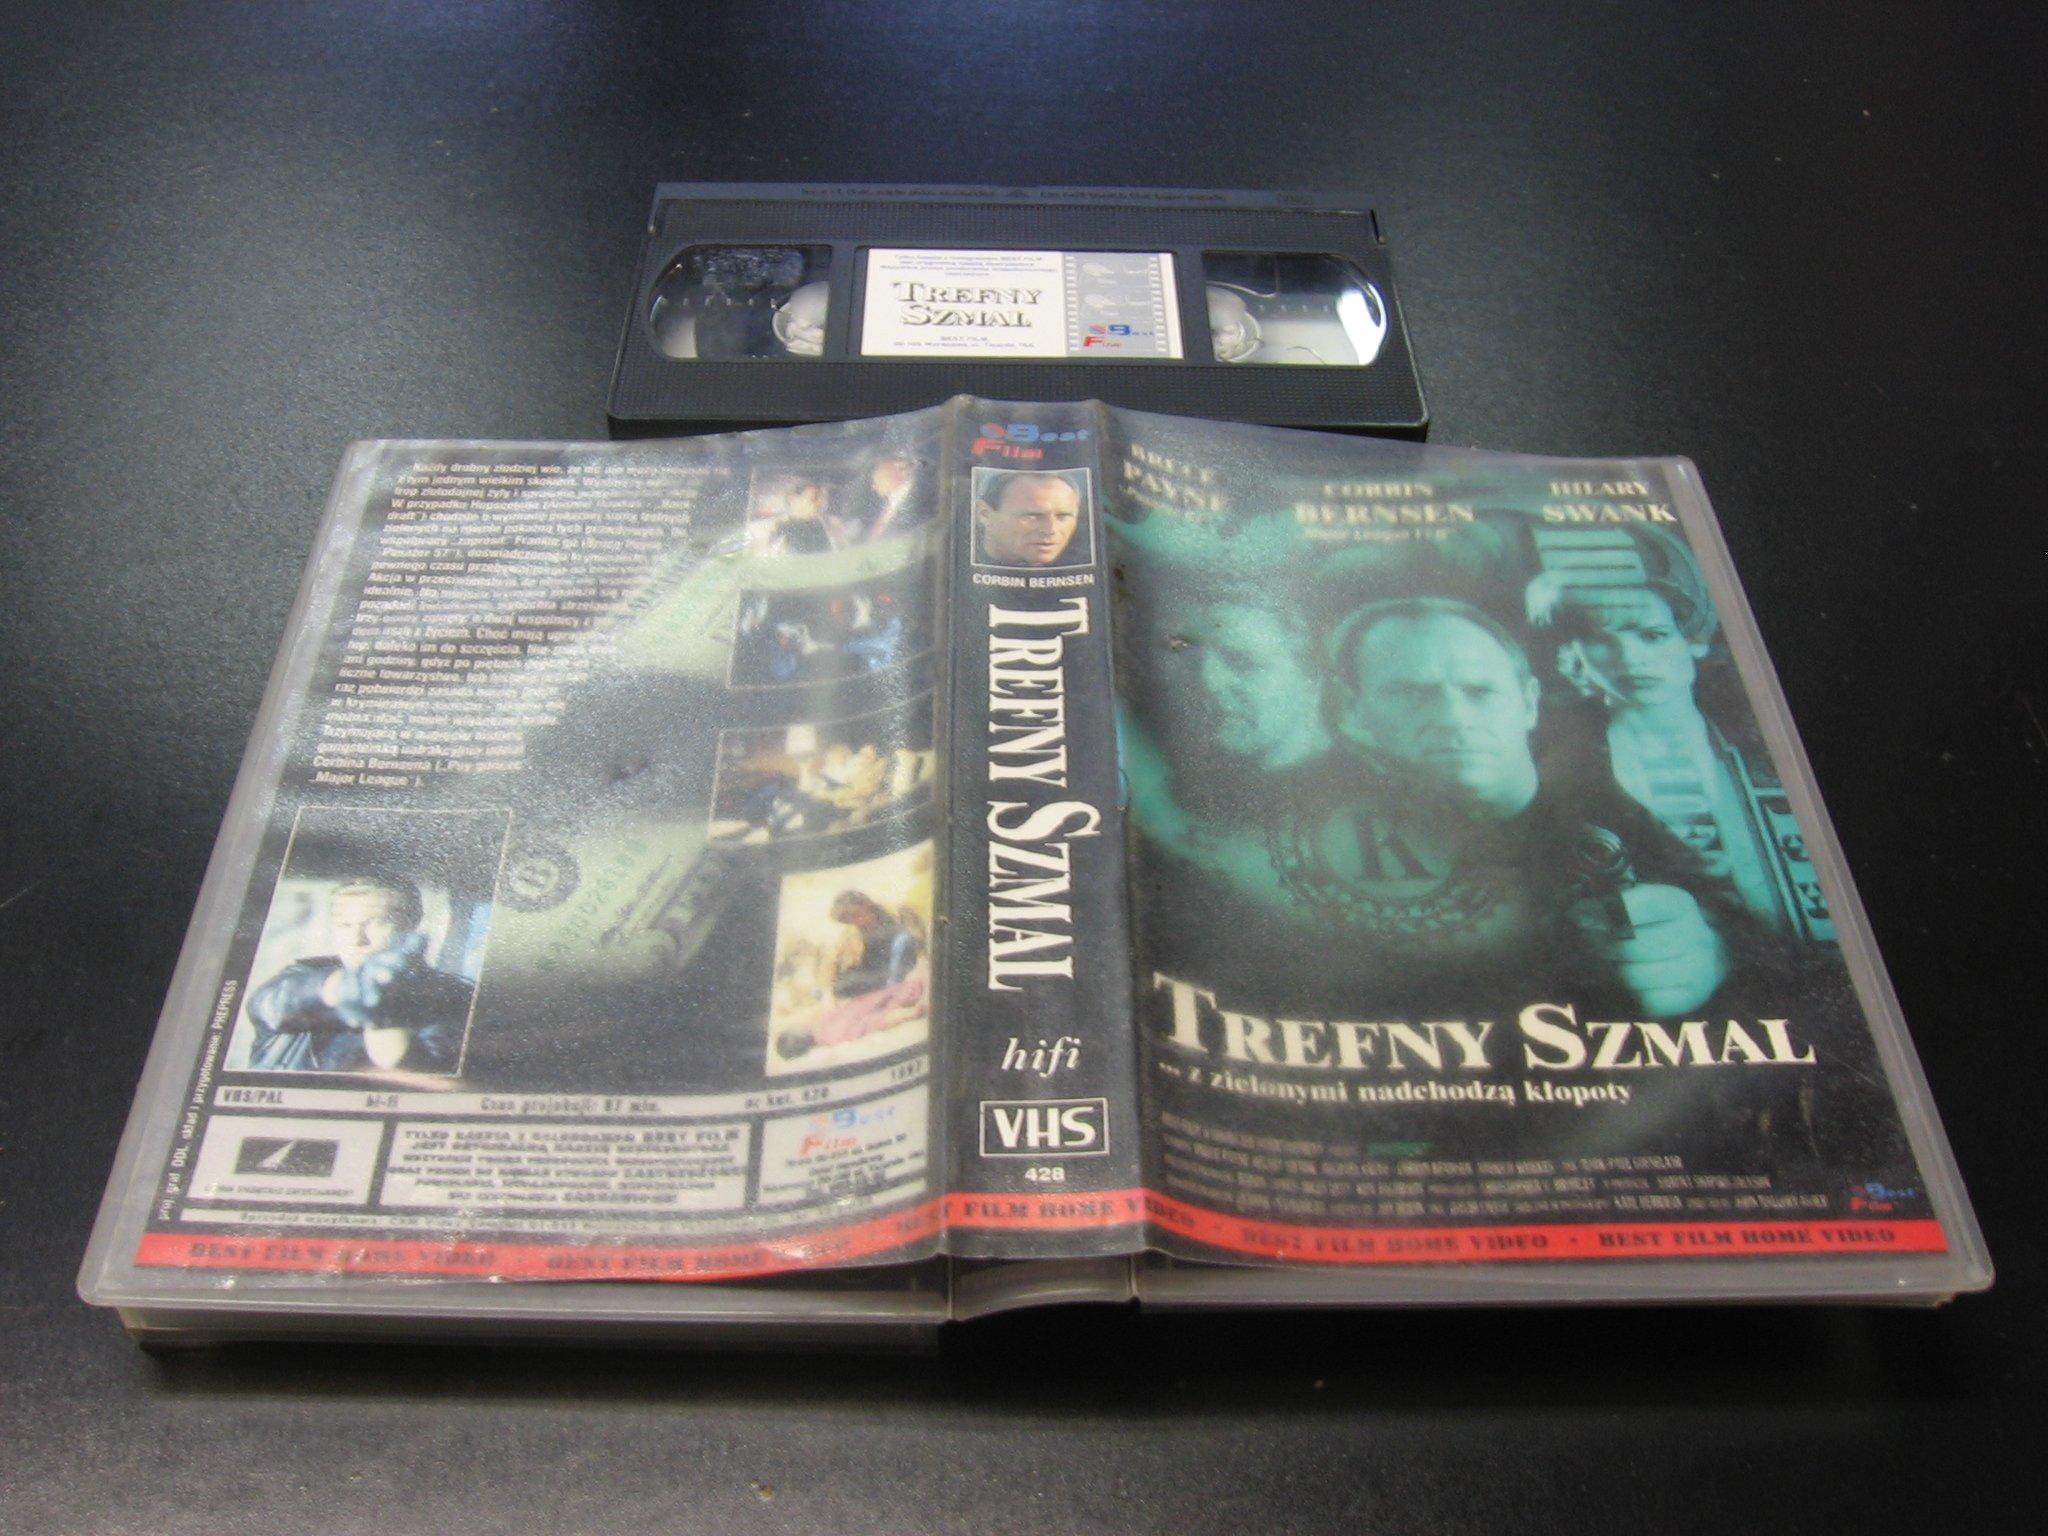 TREFNY SZMAL ```````````` VHS ```````````` Opole 0401